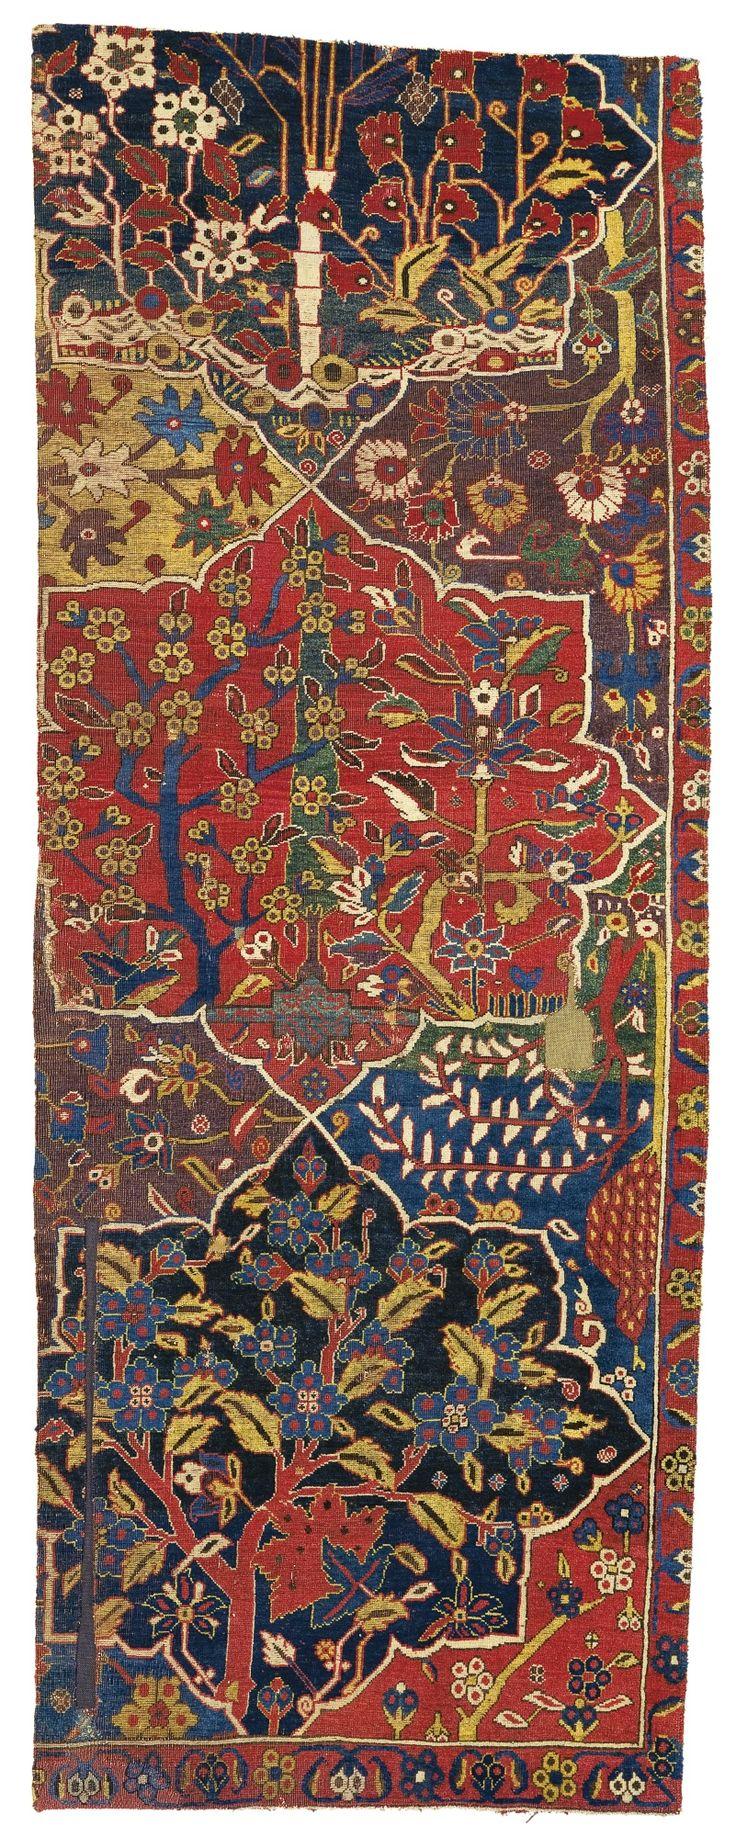 Lot 92| Sotheby's Rug Sale Northwest Persian Garden Carpet Fragment